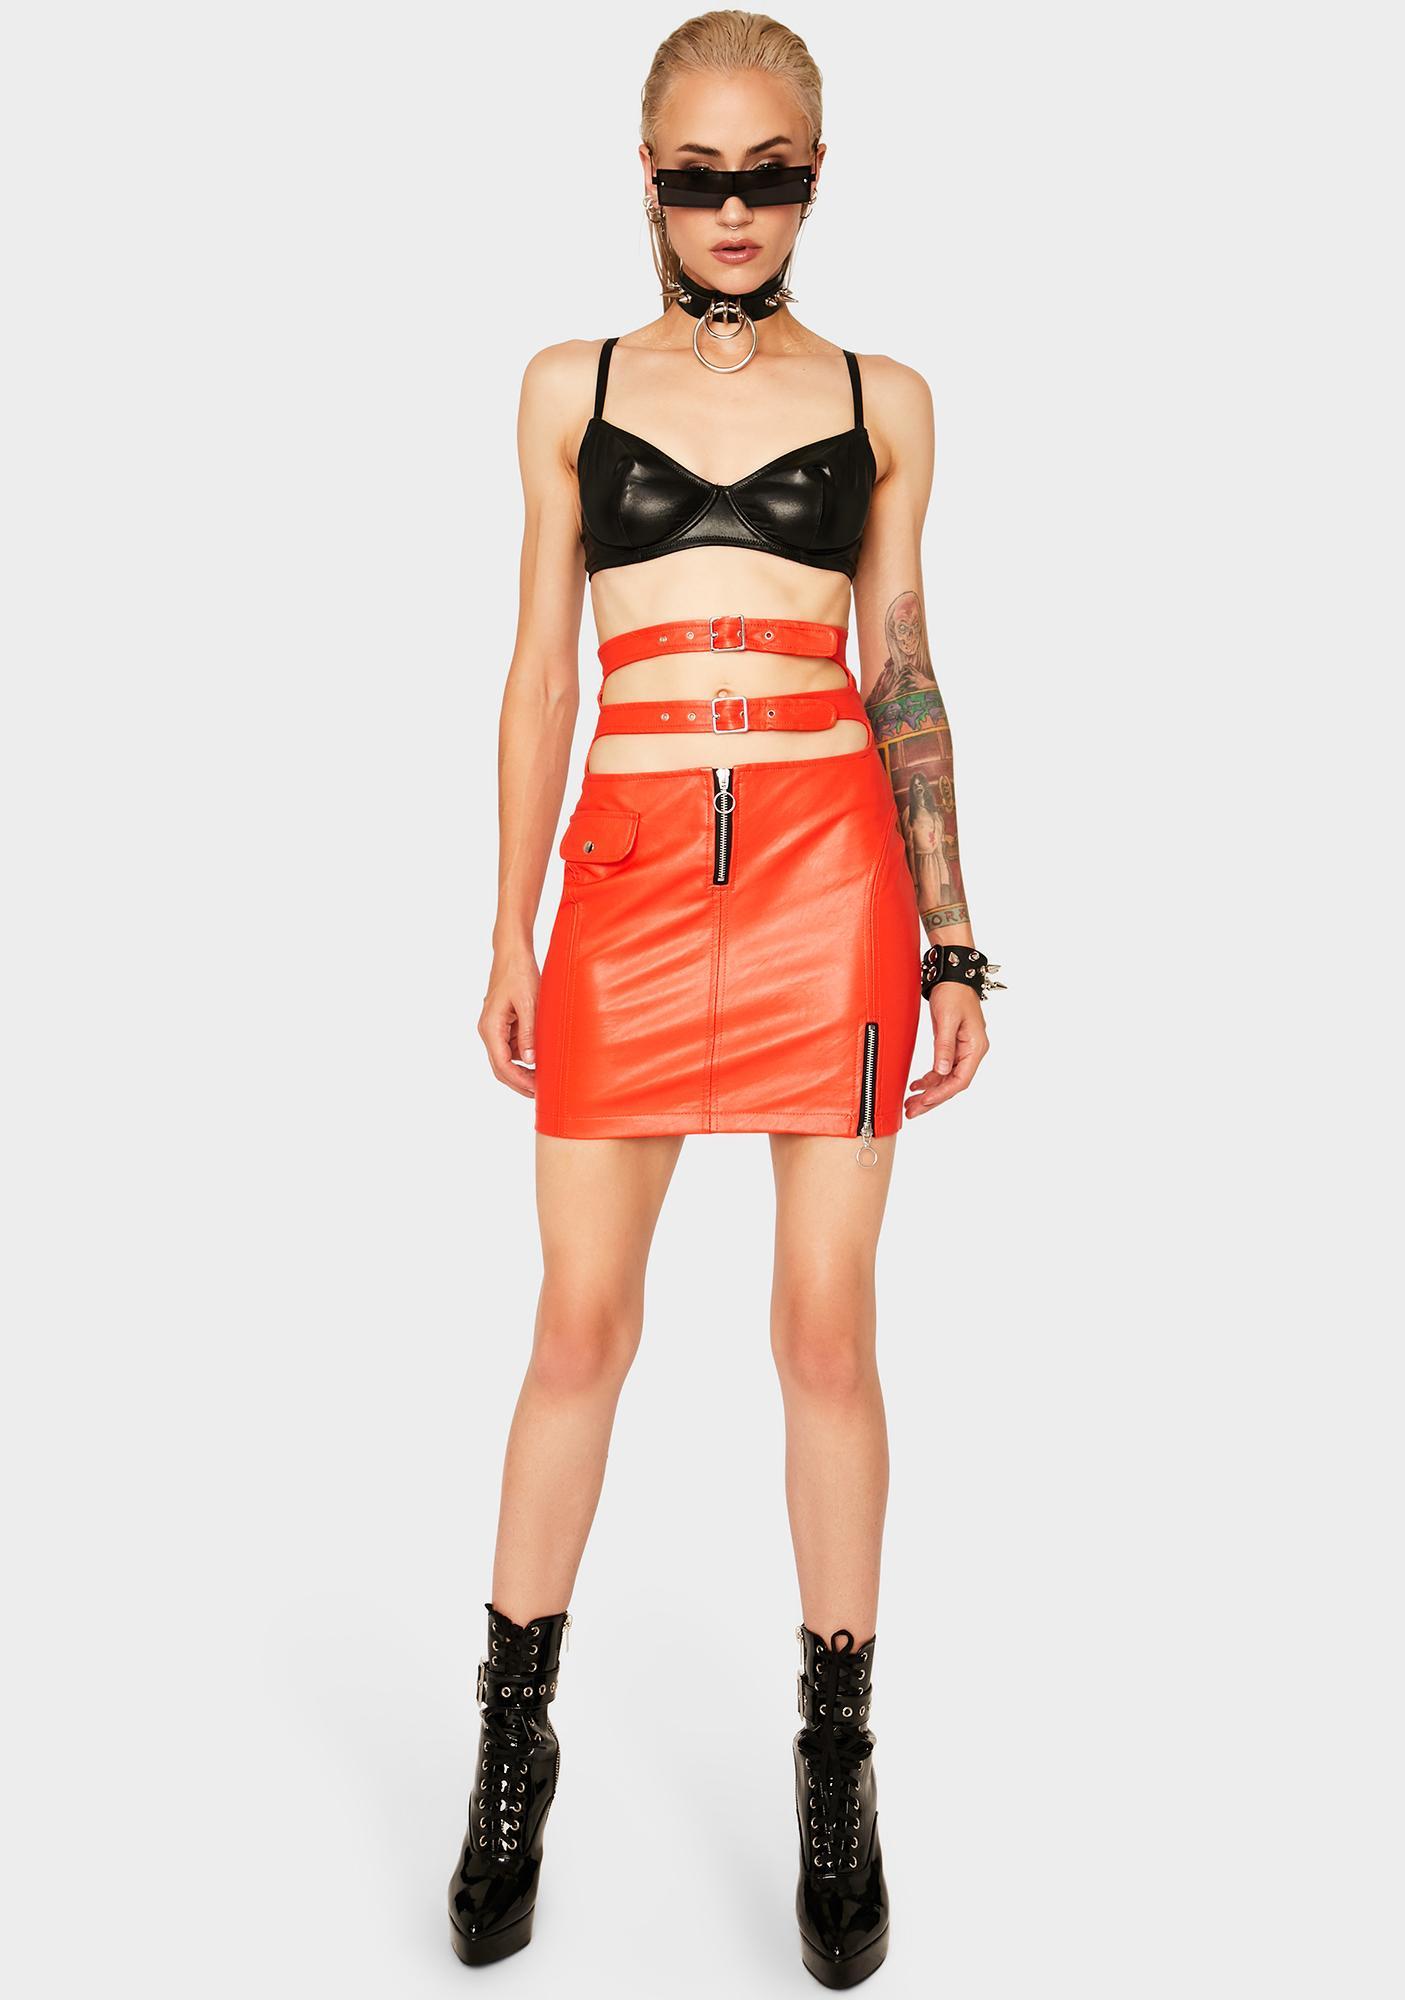 Strange Couture Faster Pussycat Vegan Leather Skirt